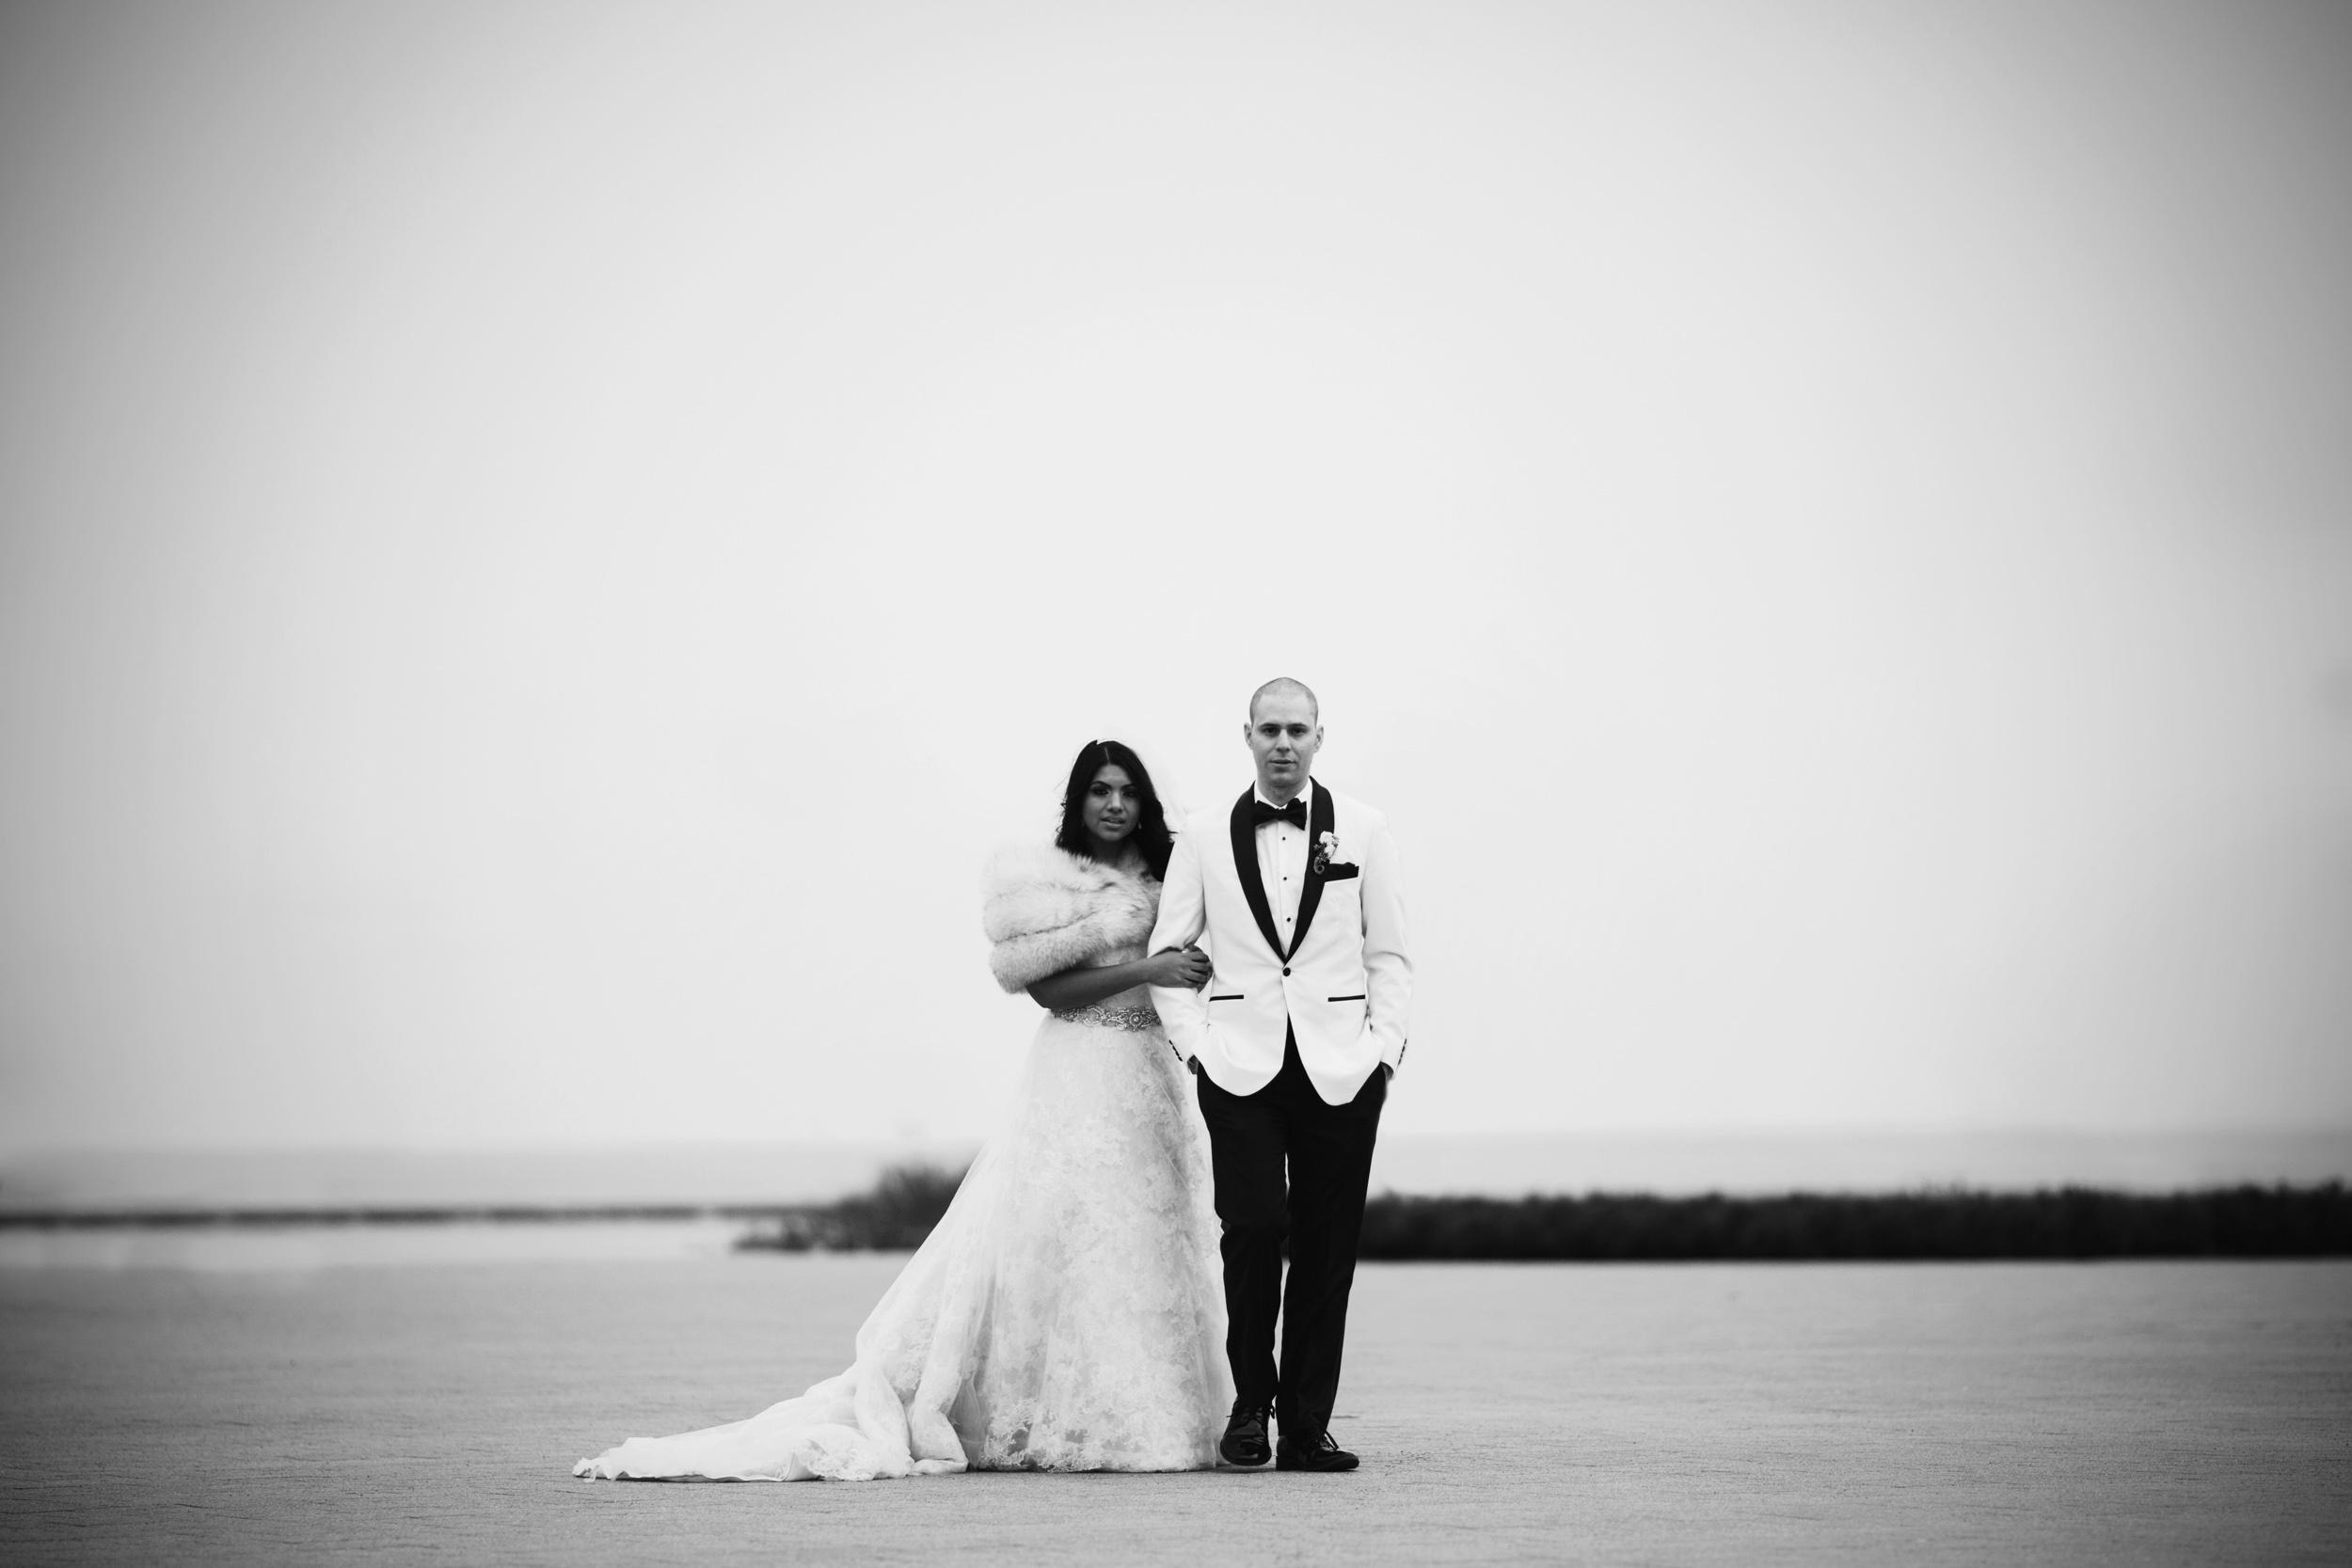 Wedding portrait by Lake Michigan in Chicago